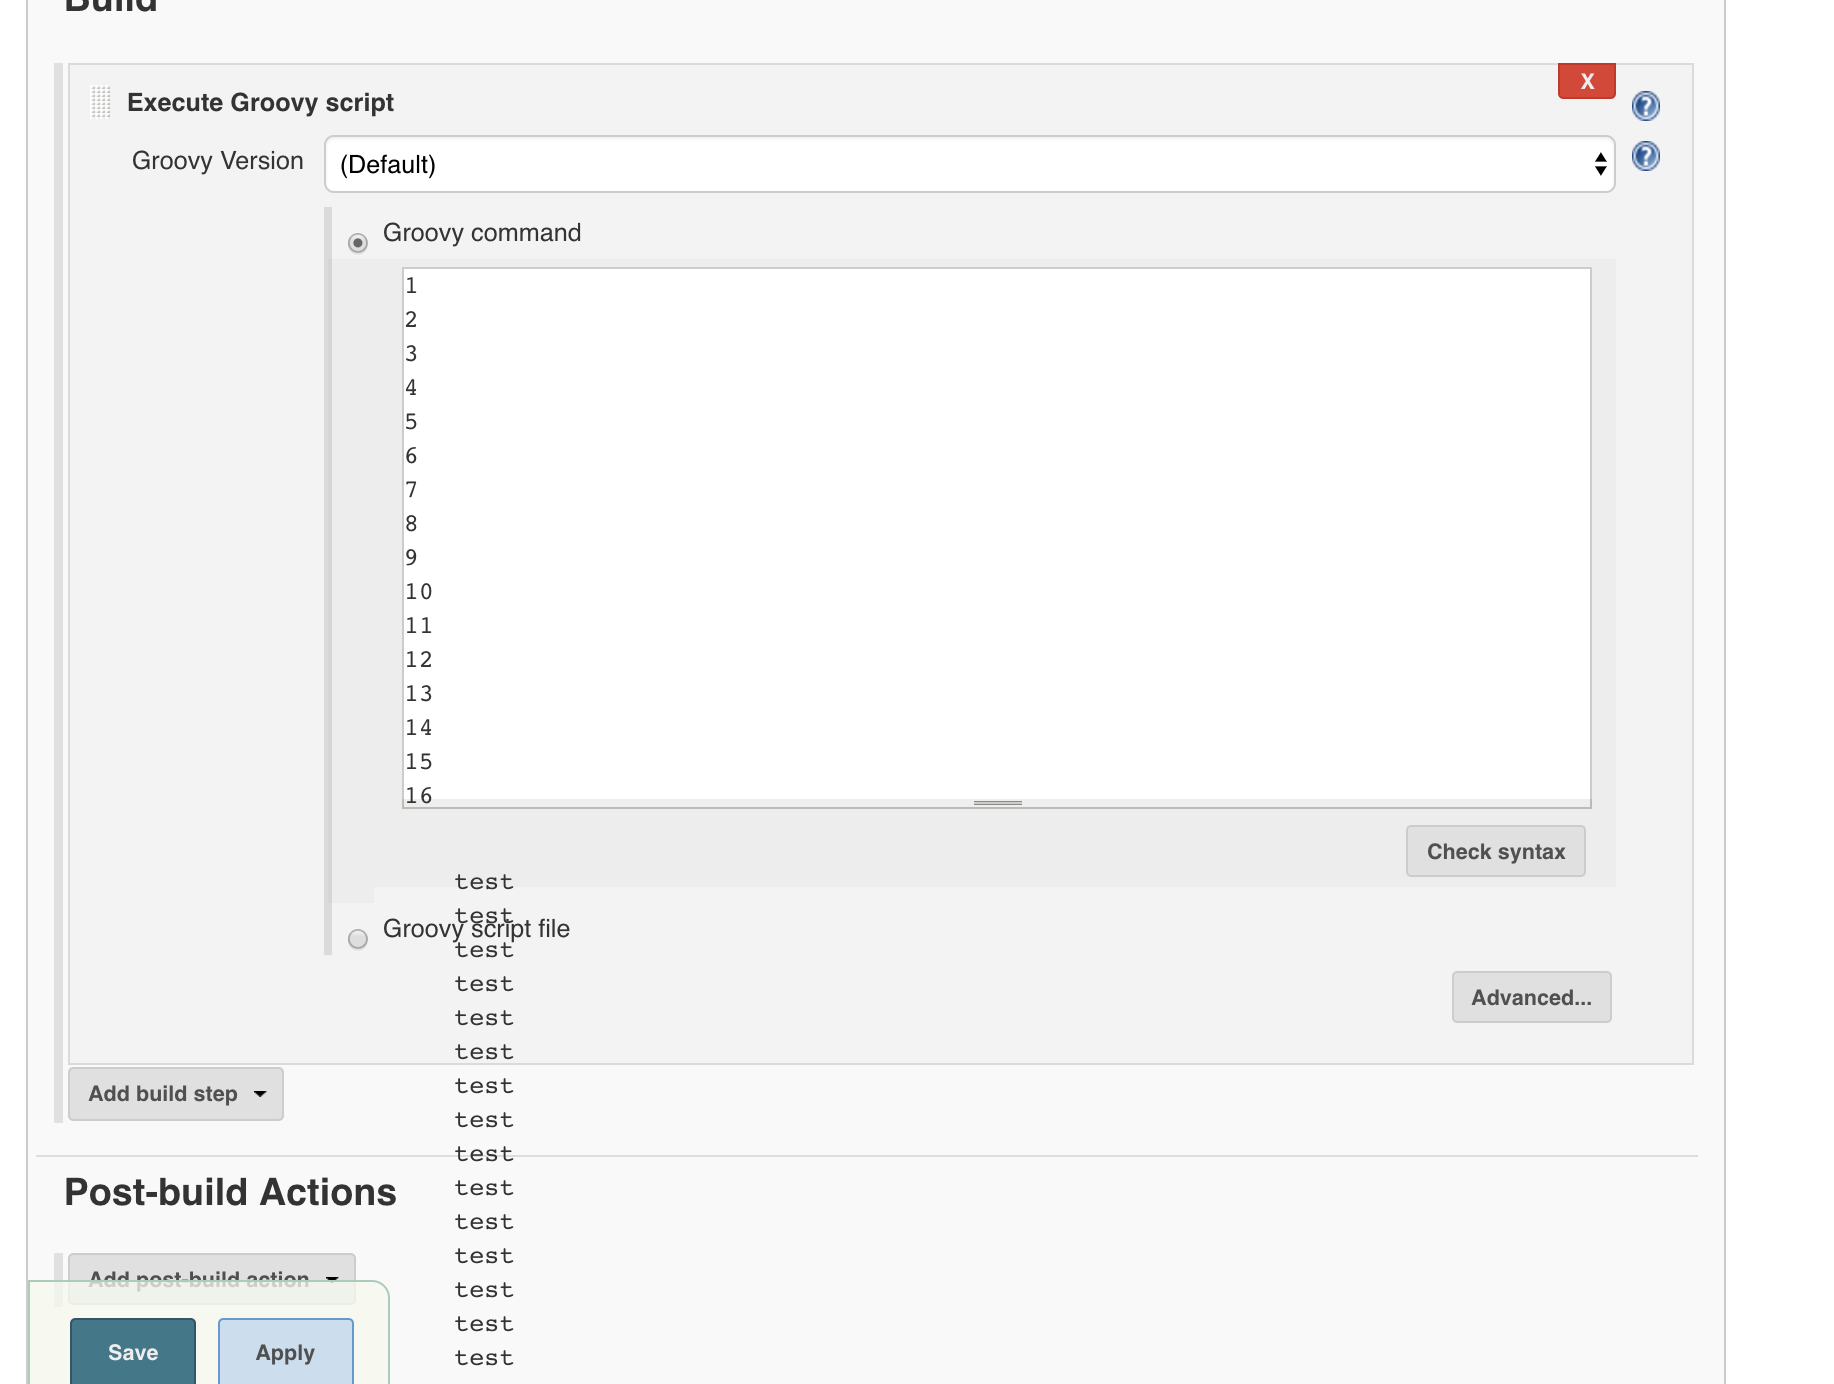 JENKINS-44709] UI Layout Broken affecting Groovy Build Step